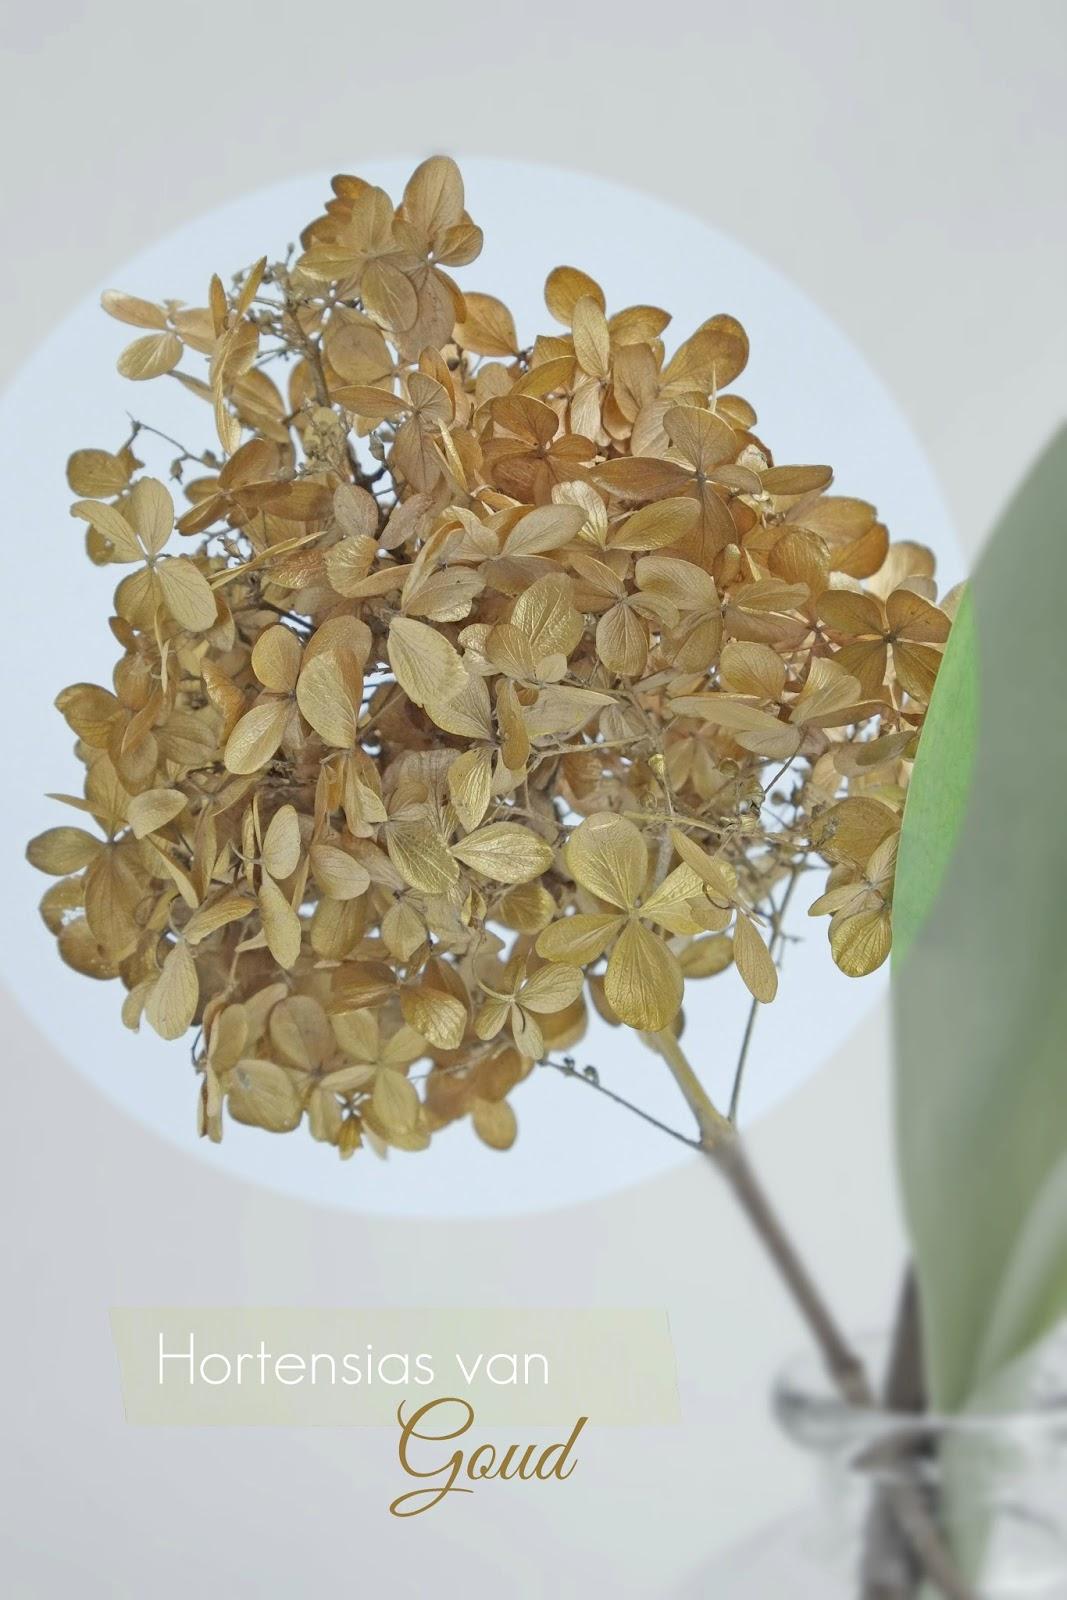 Hortensia's van Goud - Diy